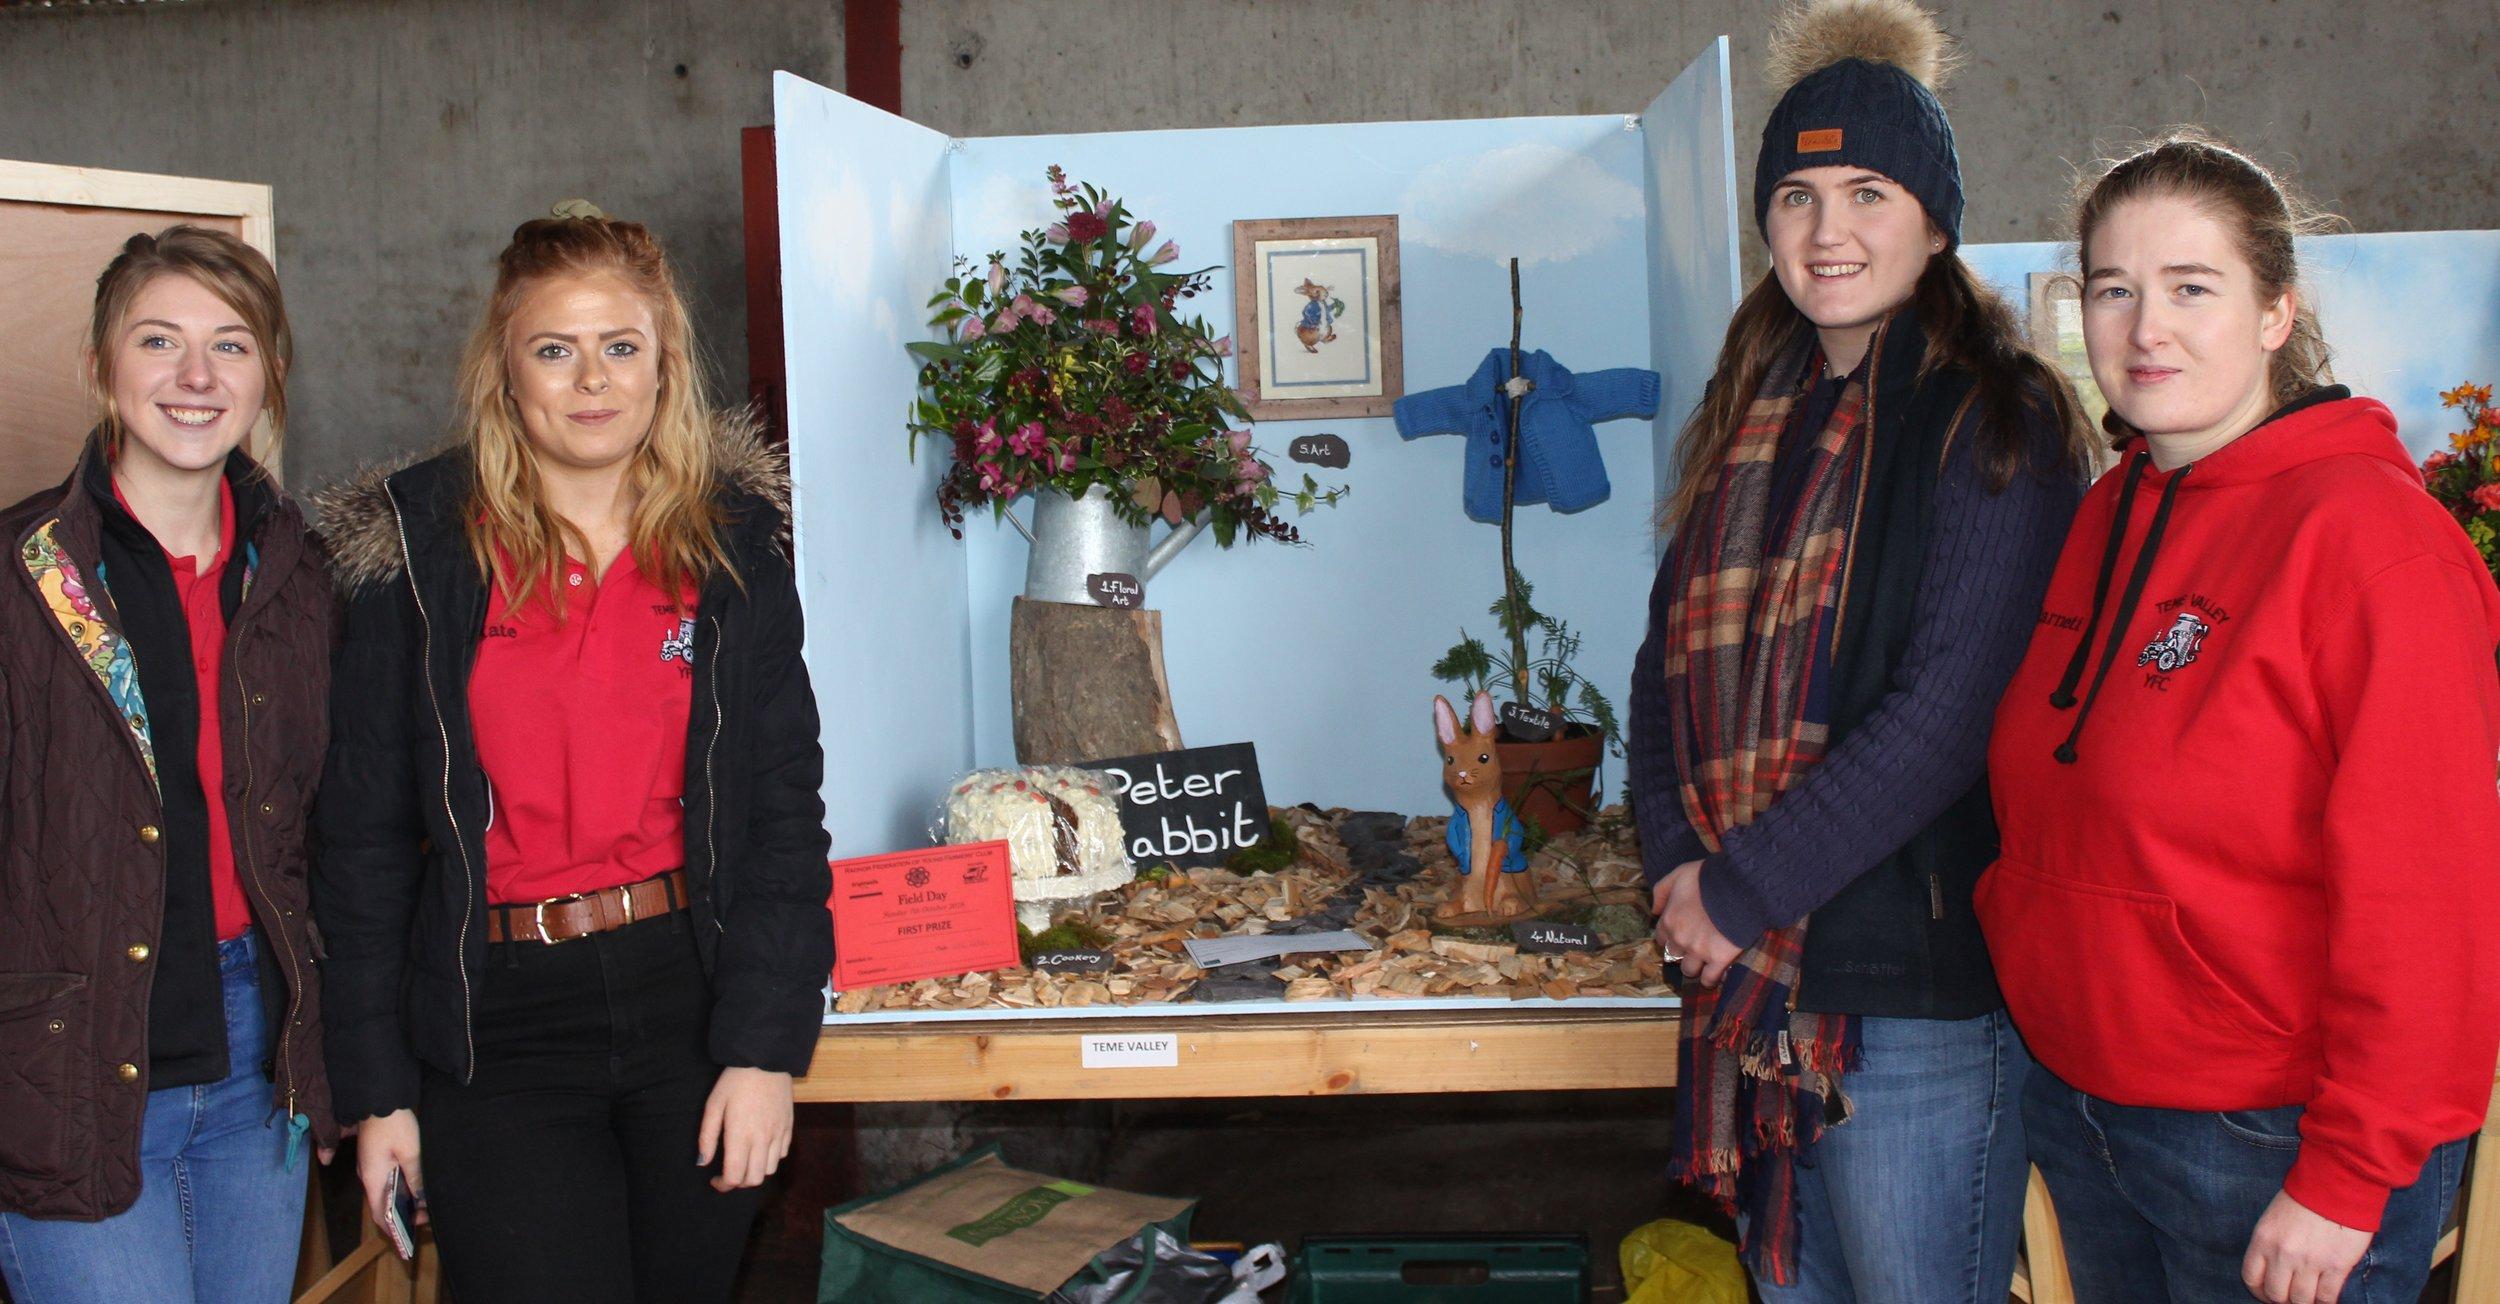 Elizabeth Swancott, Kate Reynolds, Ella Harris & Kim Barnett, Teme Valley YFC with their first prize Cube Exhibit